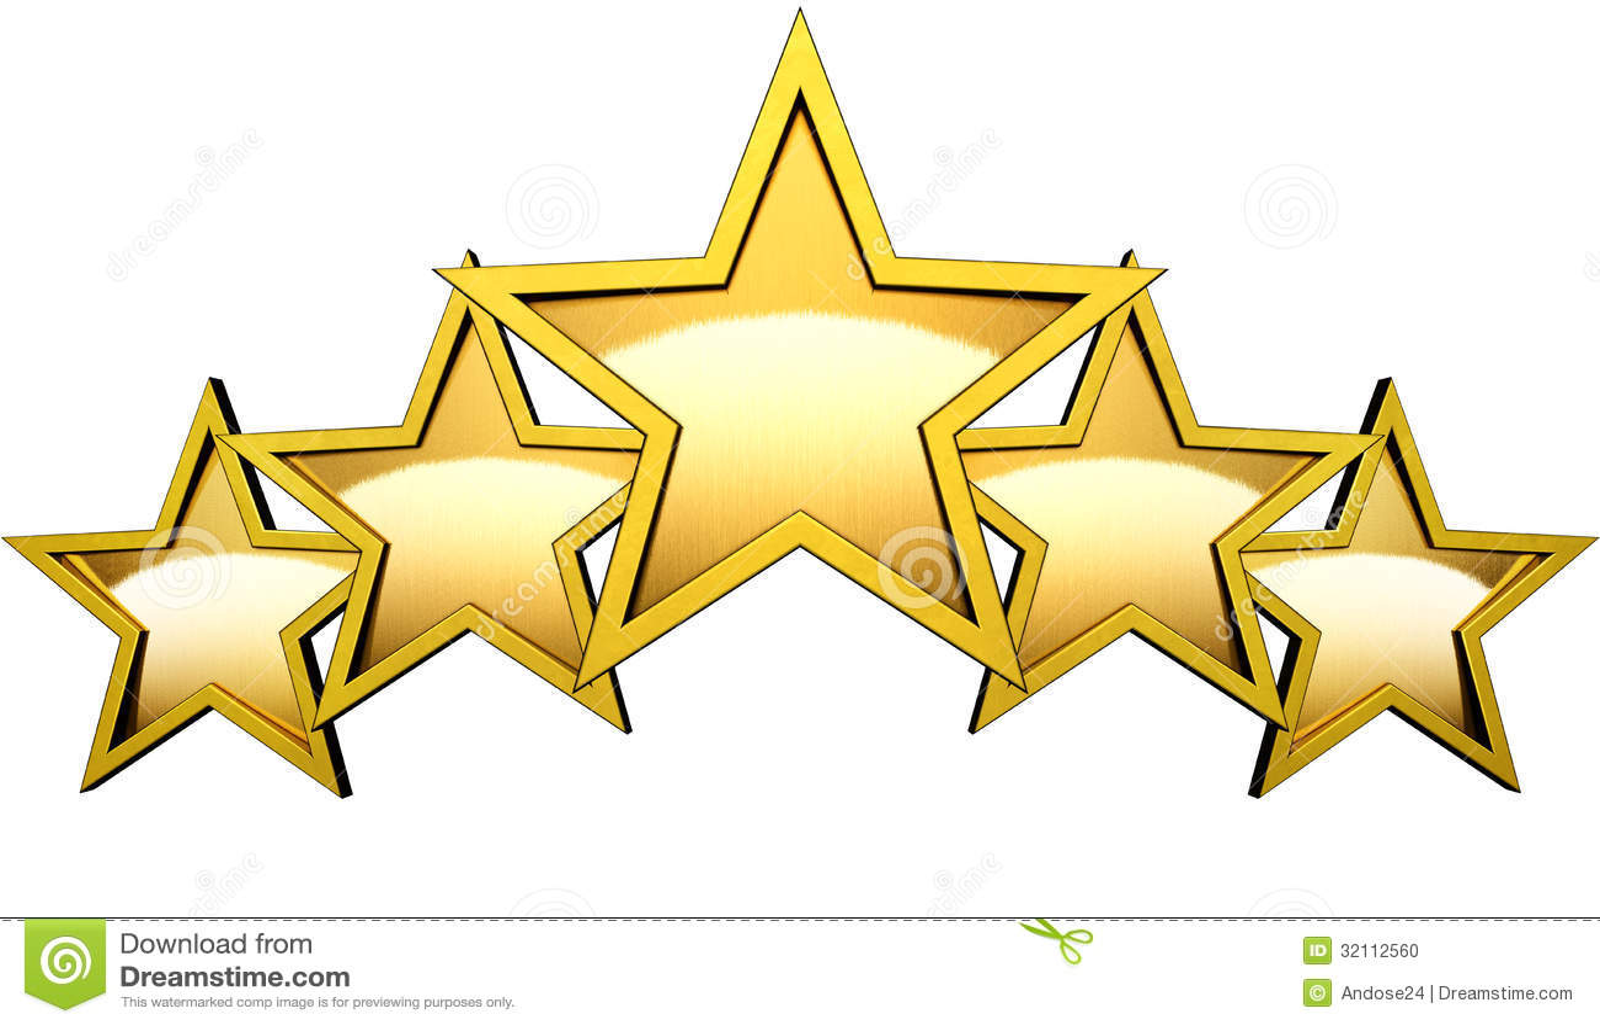 stars stock photo image 32112560 gold star clip art images Gold Star Clip Art Printable